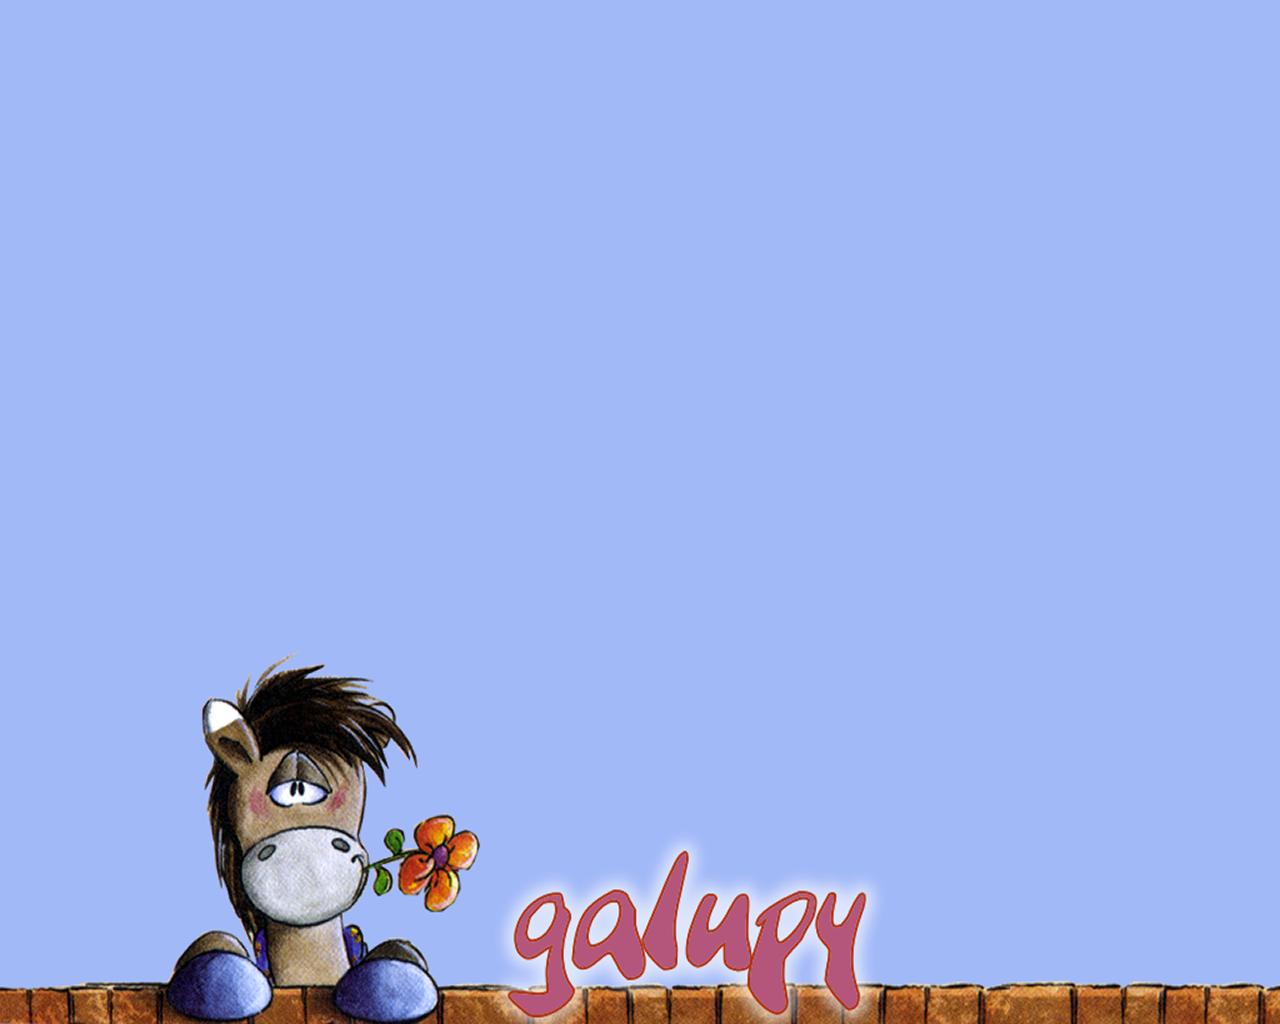 download wallpaper: Diddl's vriendje Galupy wallpaper